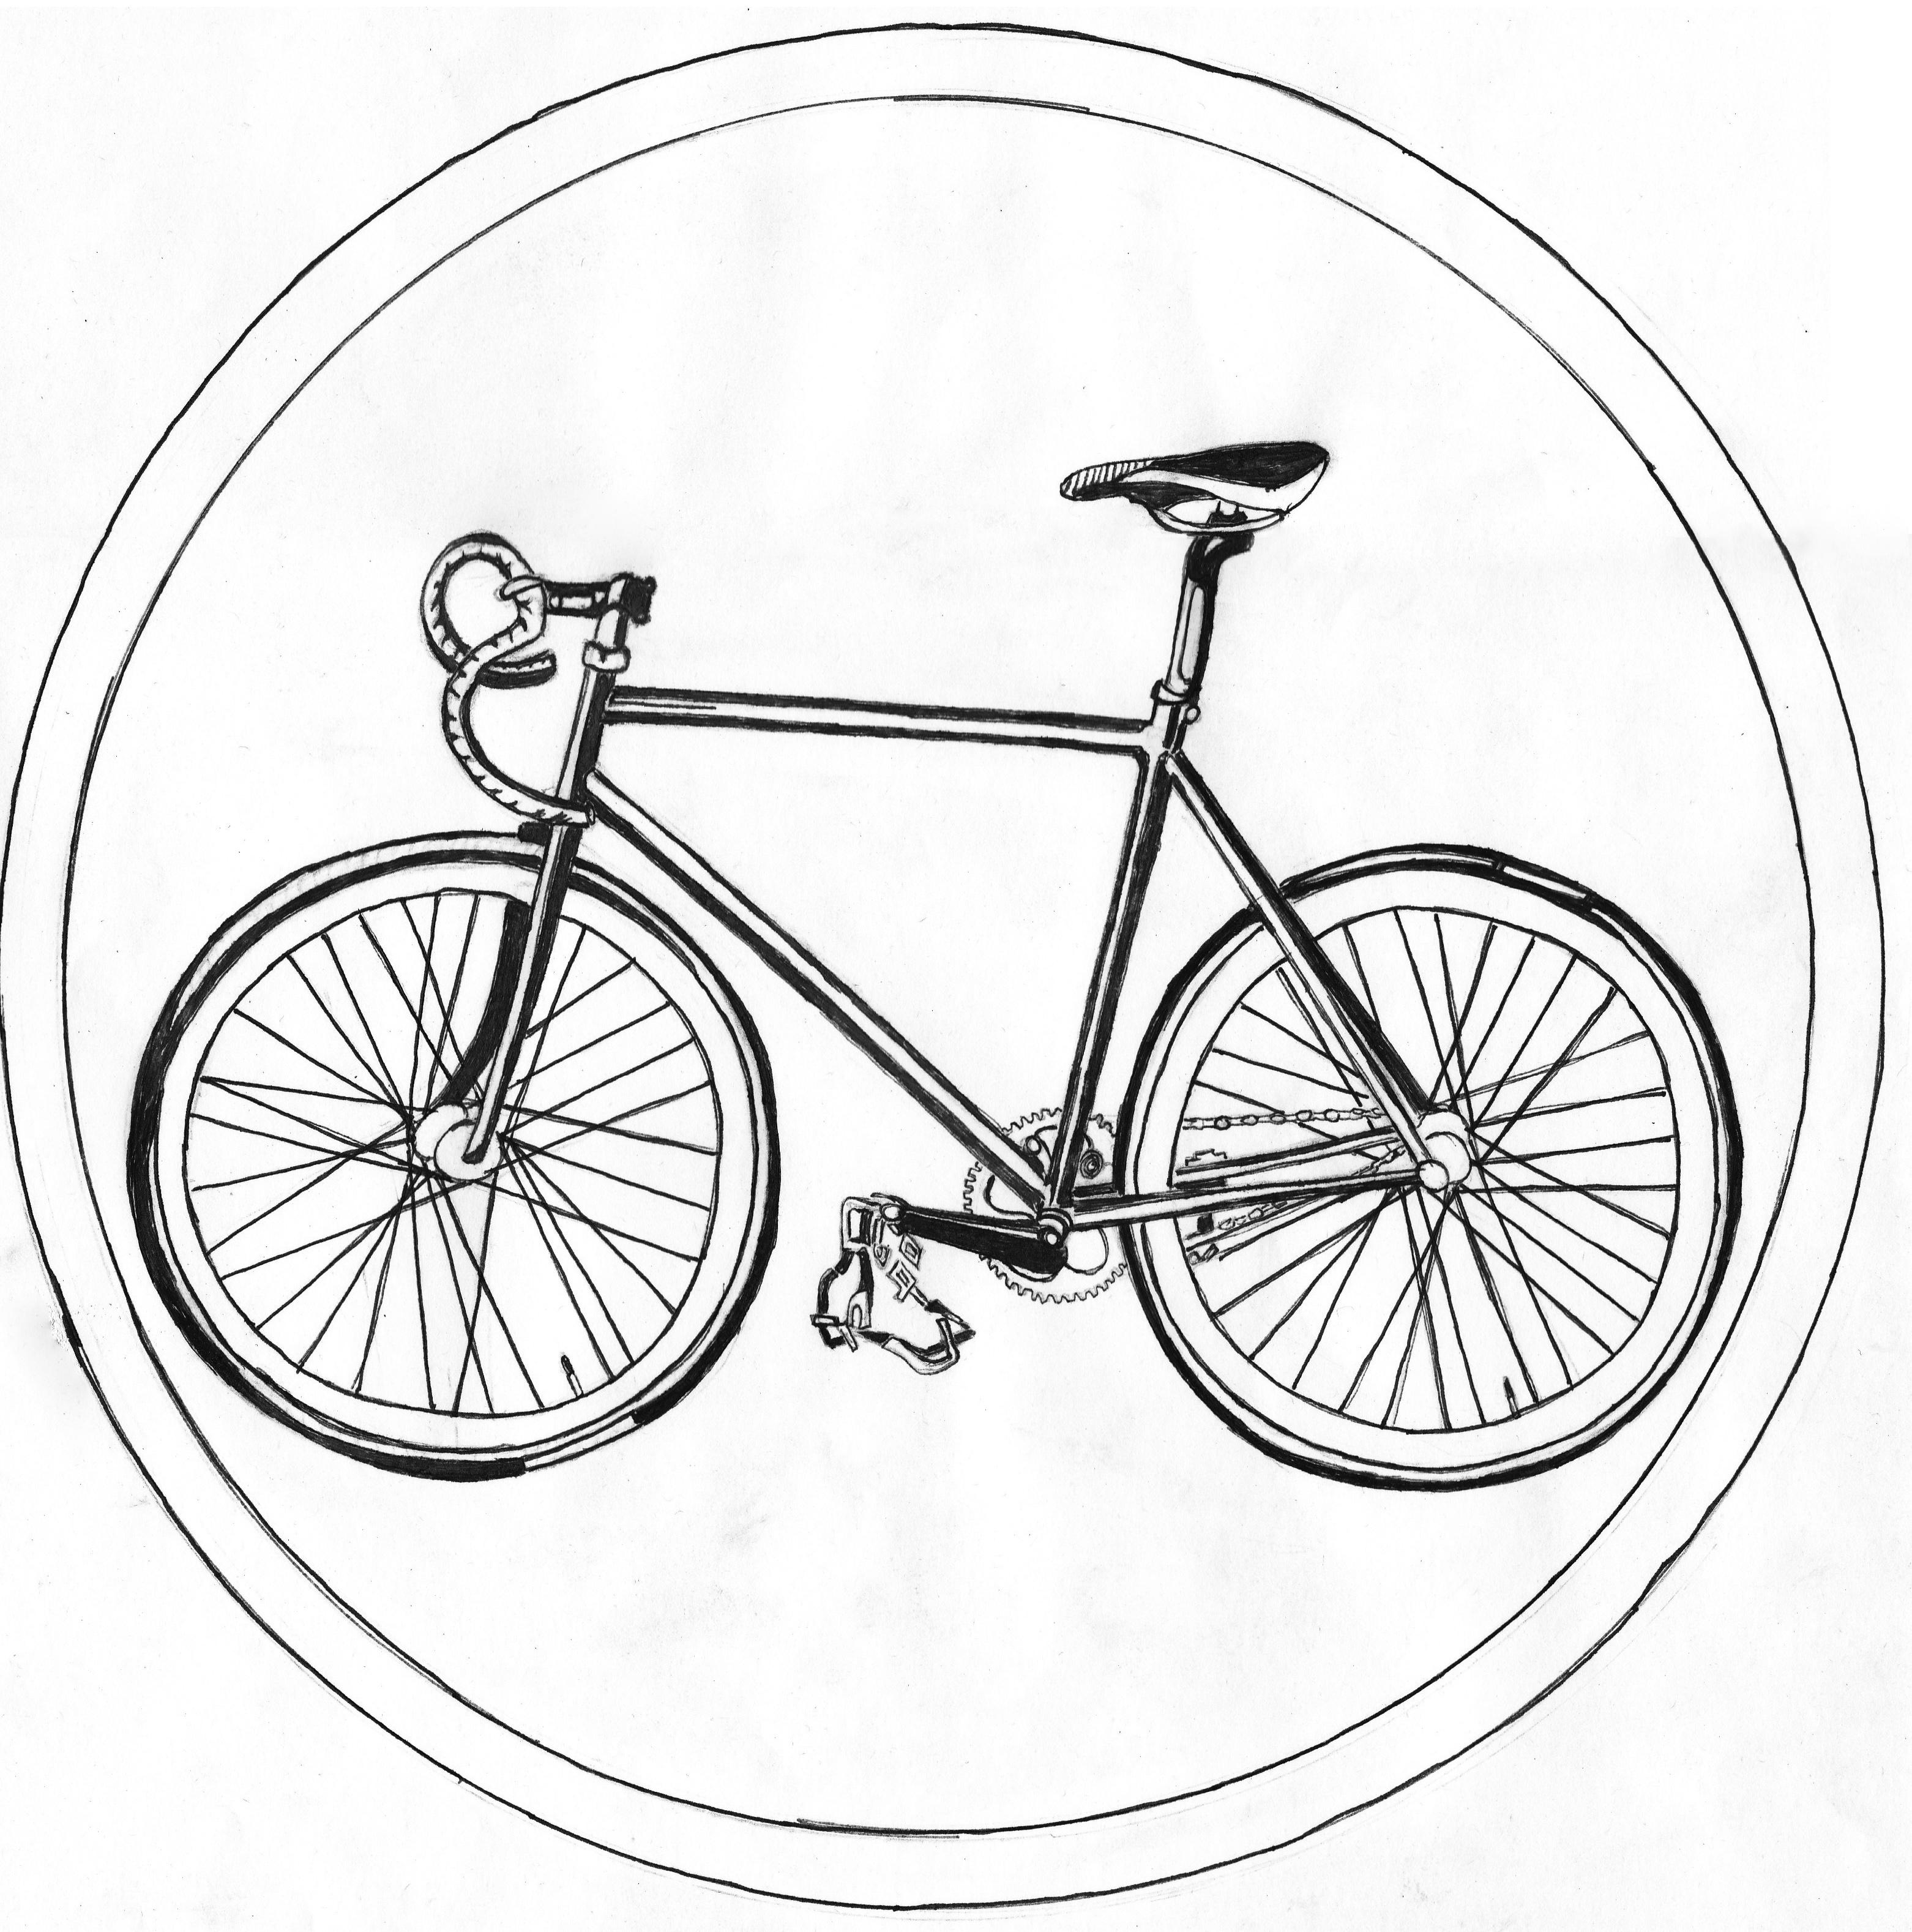 Drawn bike bicycle line #14